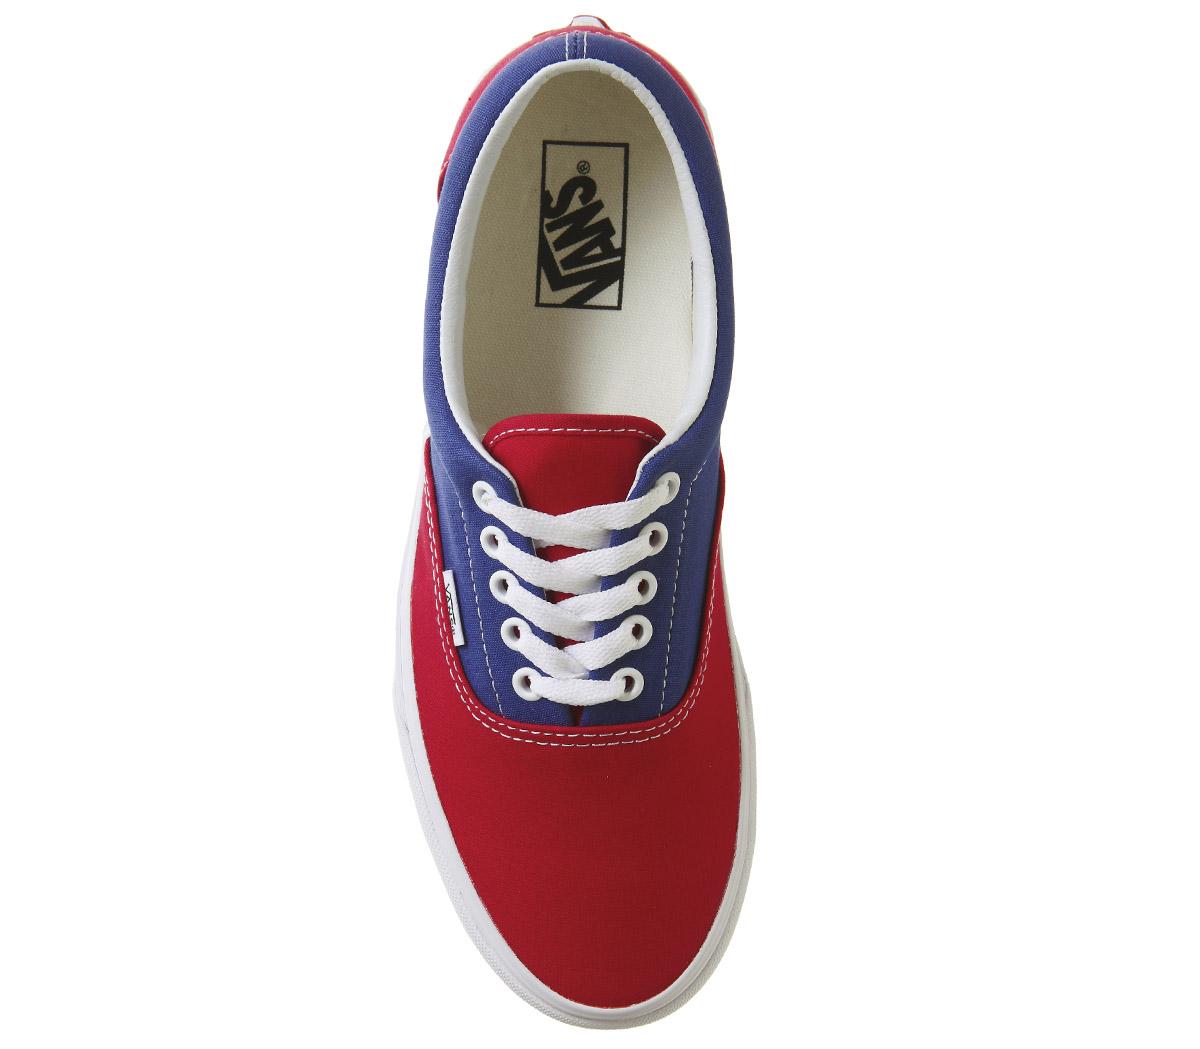 Blau Uomo Vans Era Trainers TRUE Blau  ROT CHECKER Trainers Schuhes dd6451